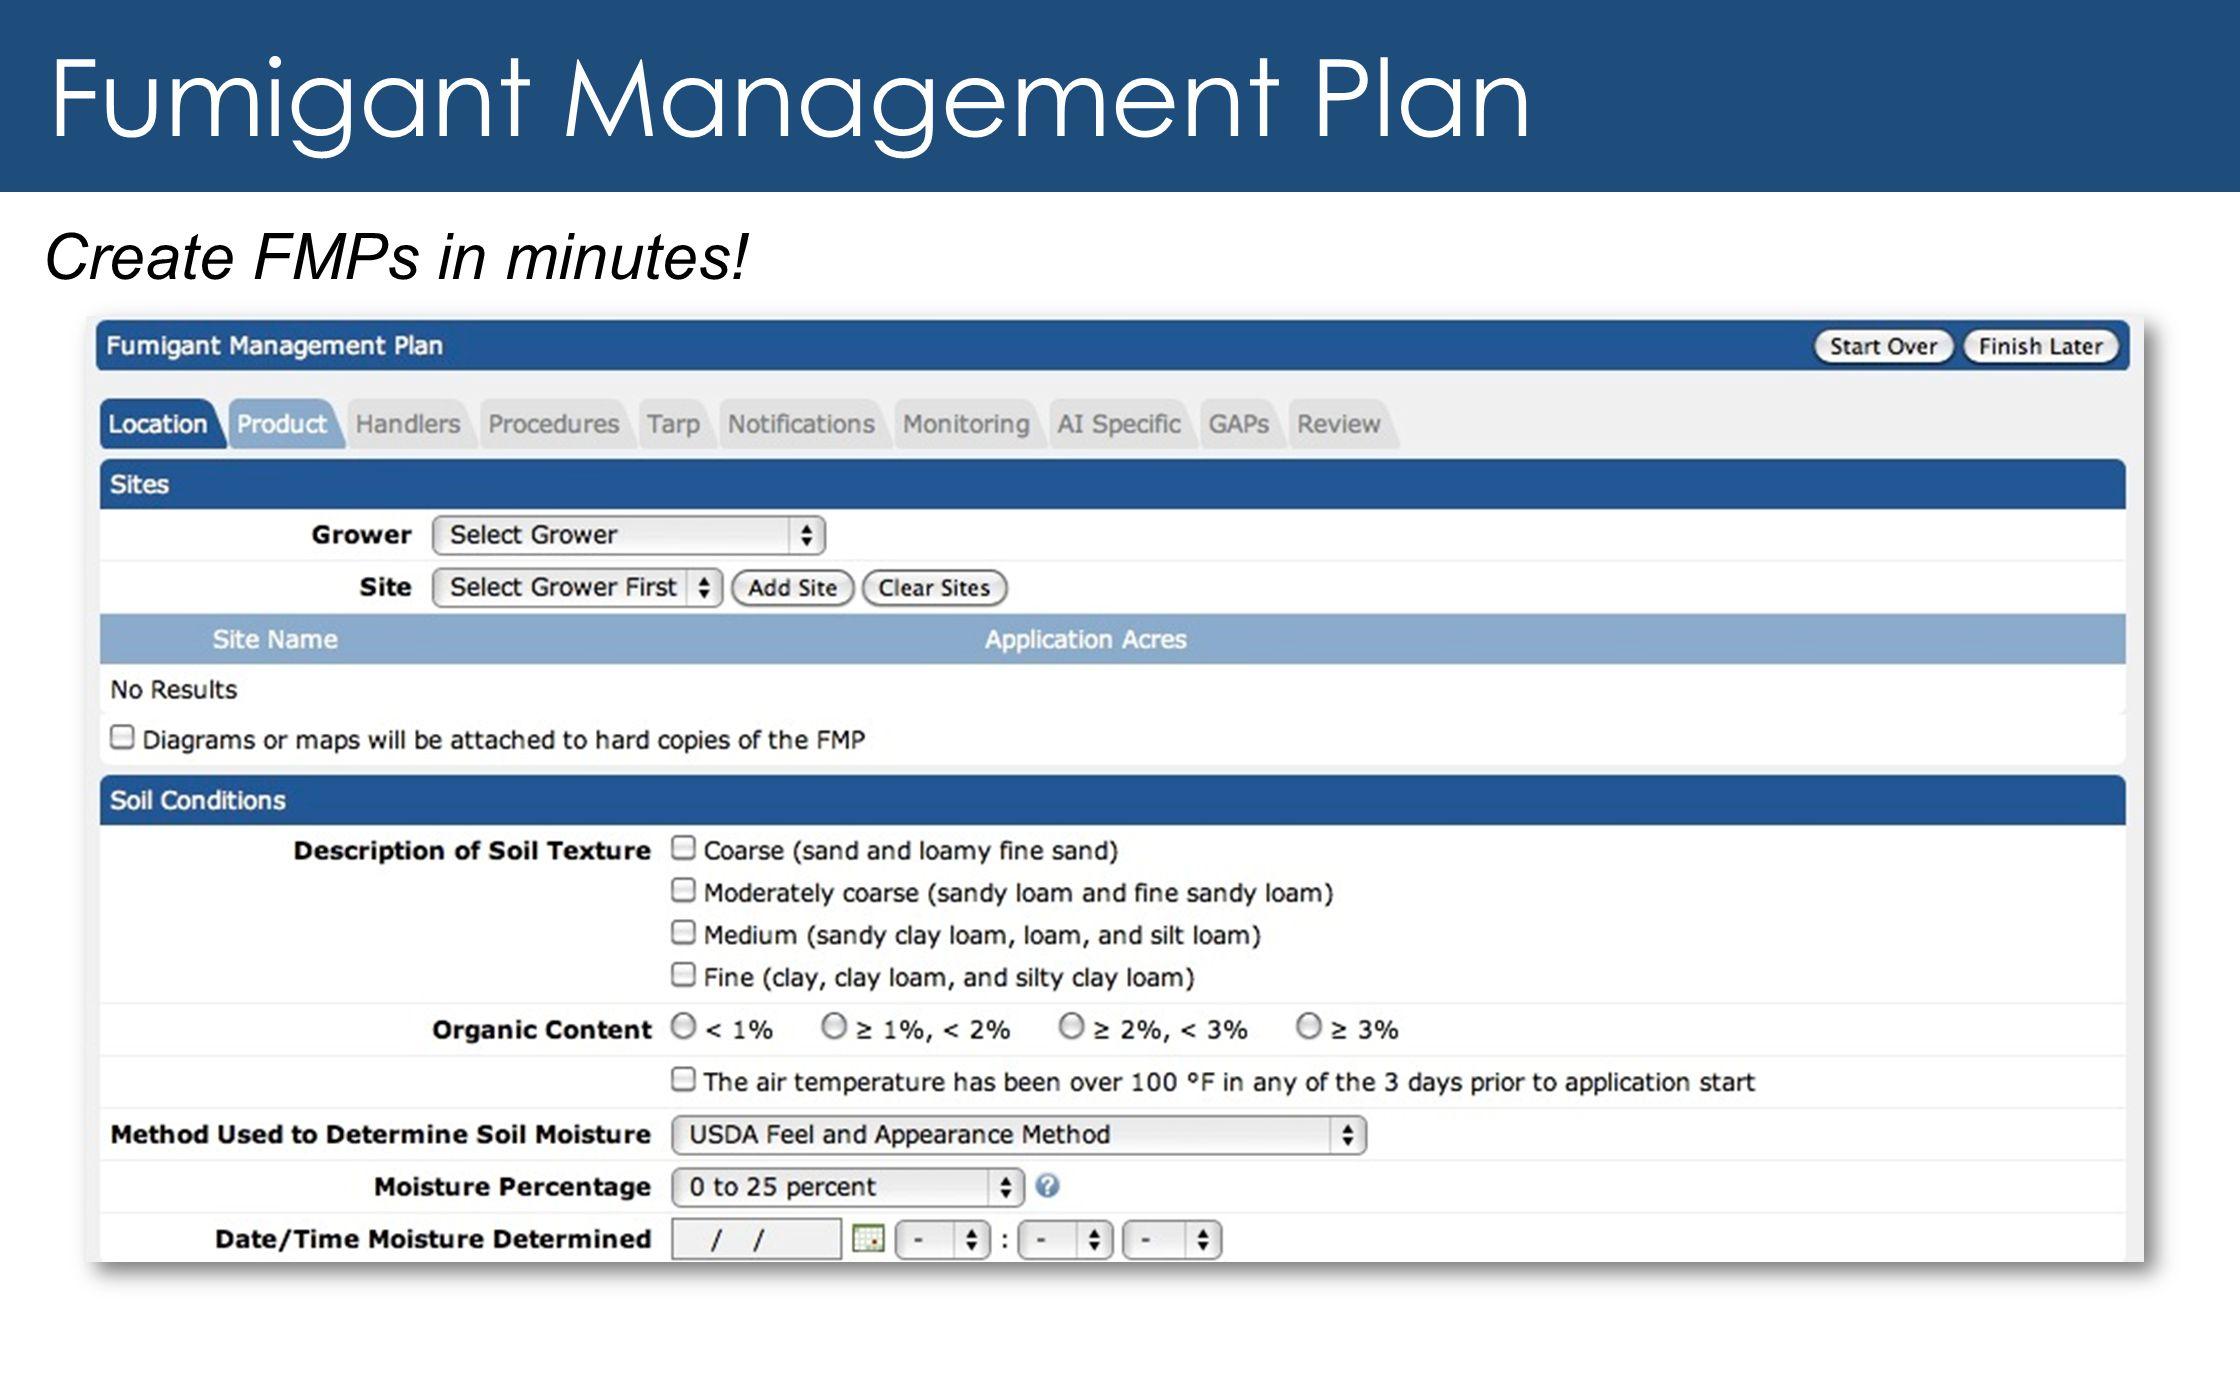 Fumigant Management Plan